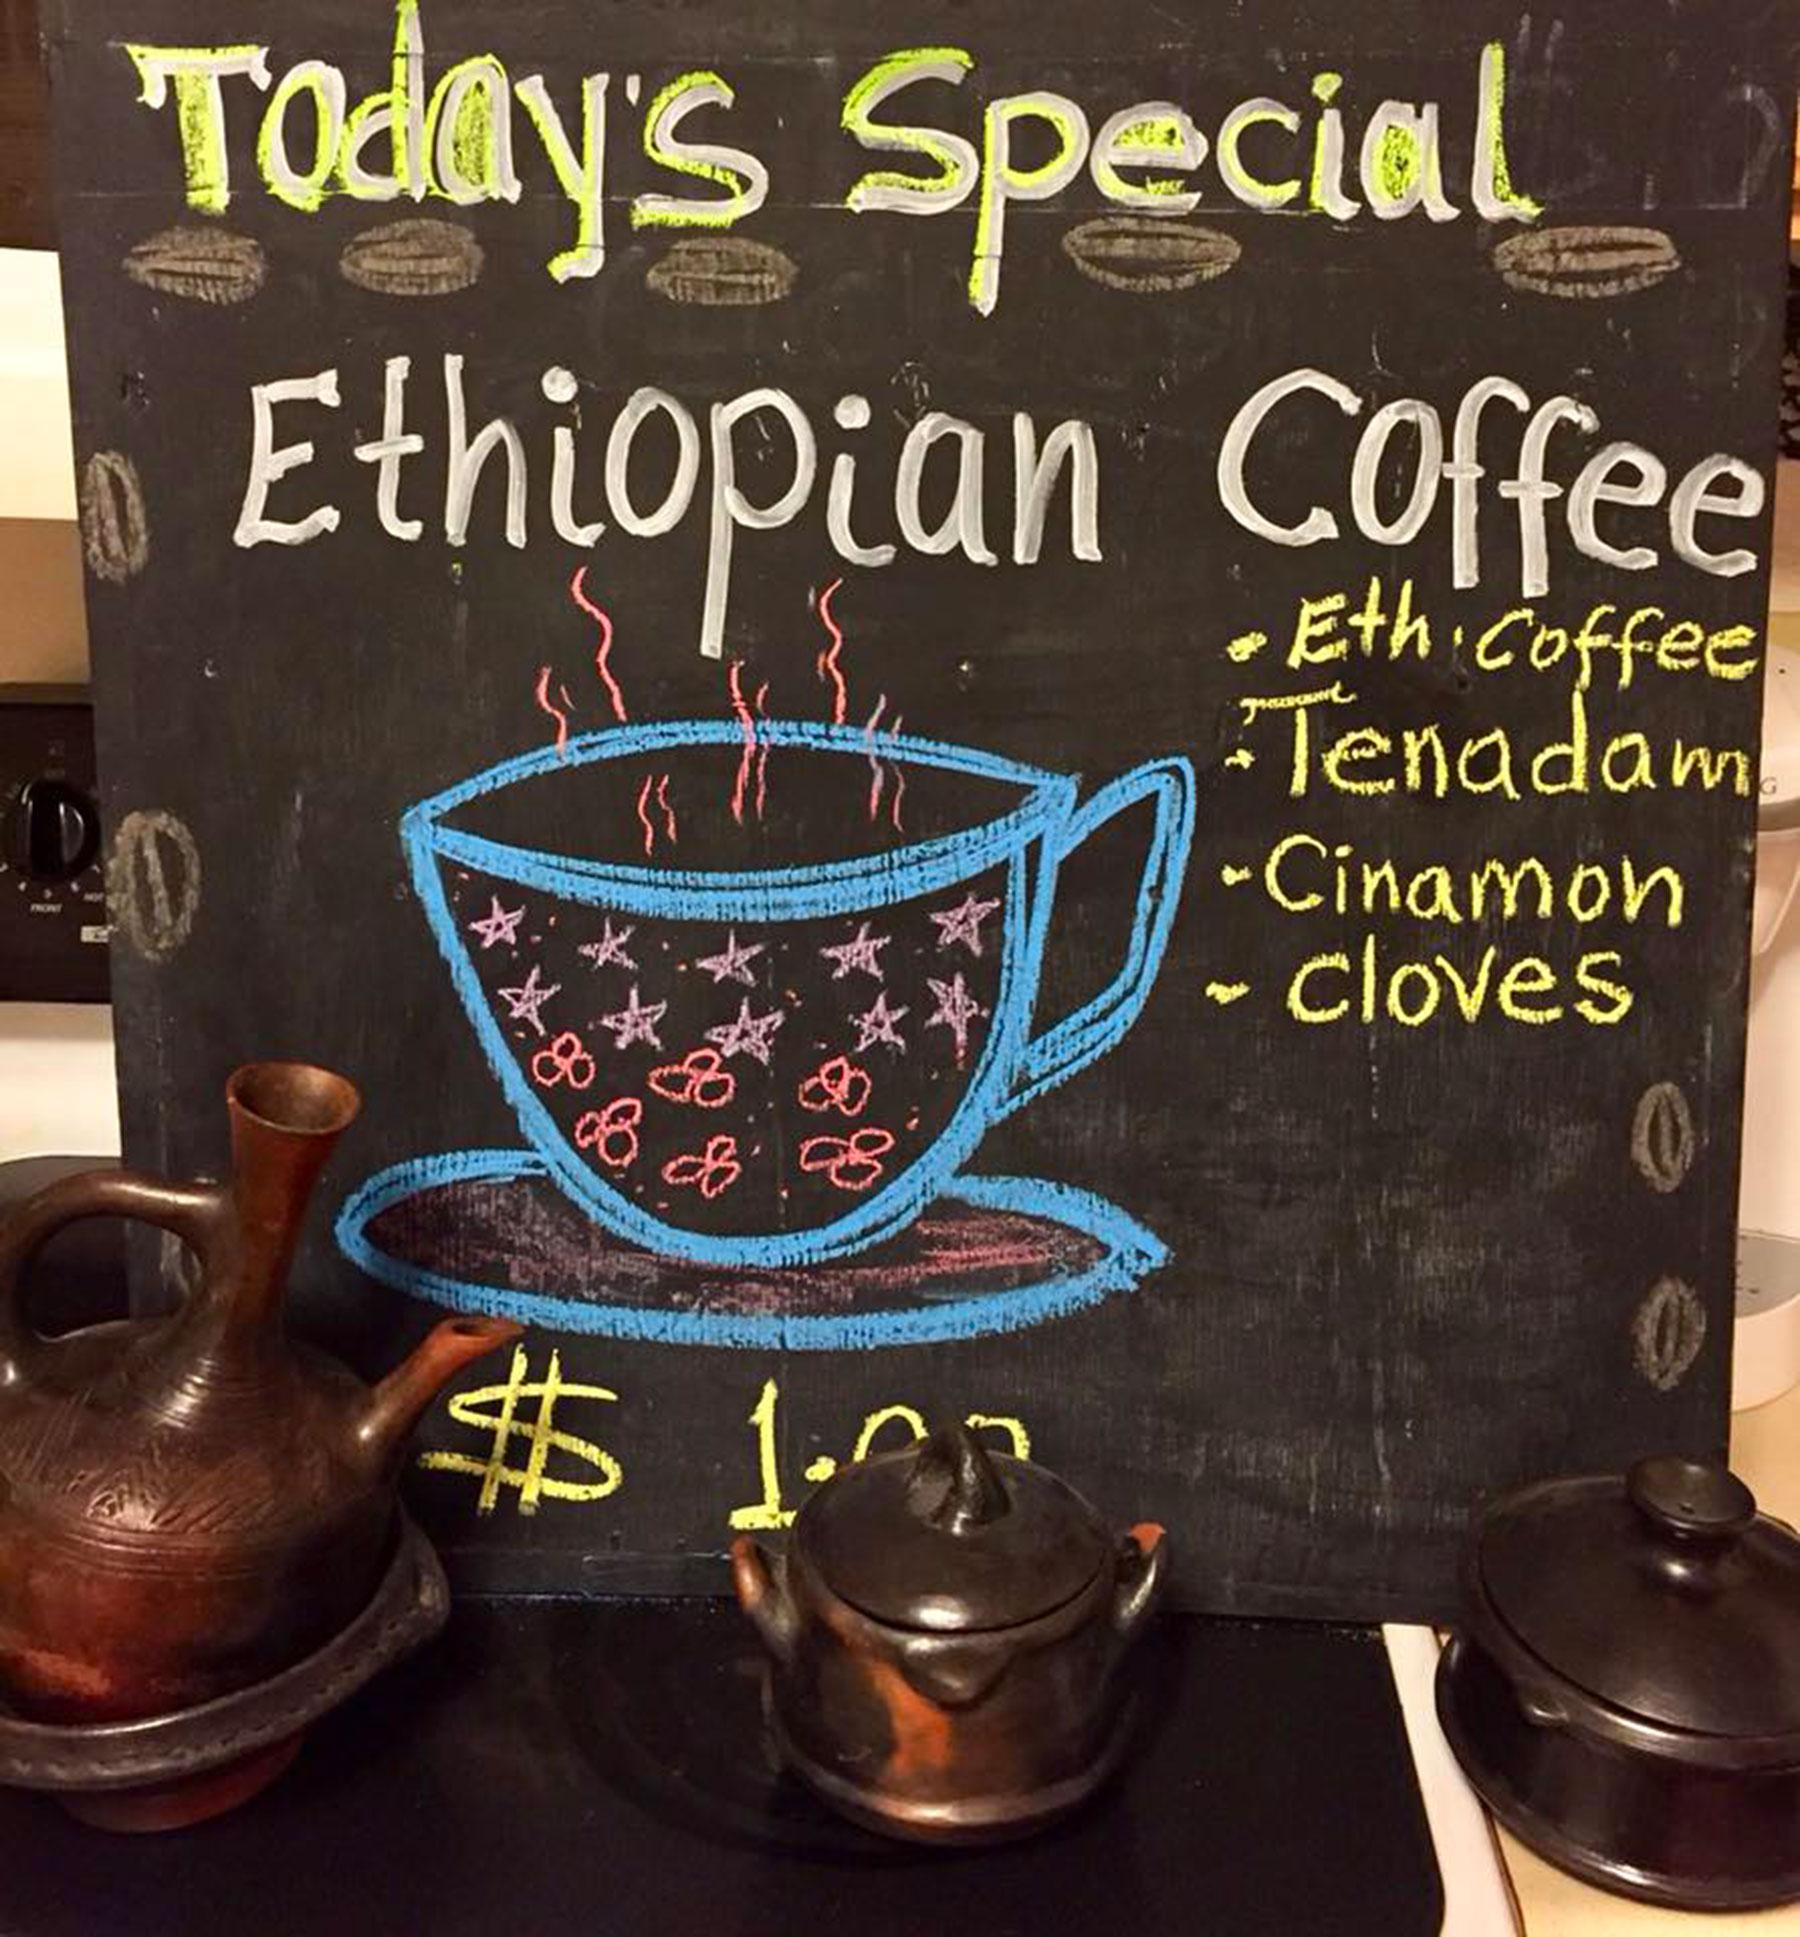 Spiced Ethiopian coffee.